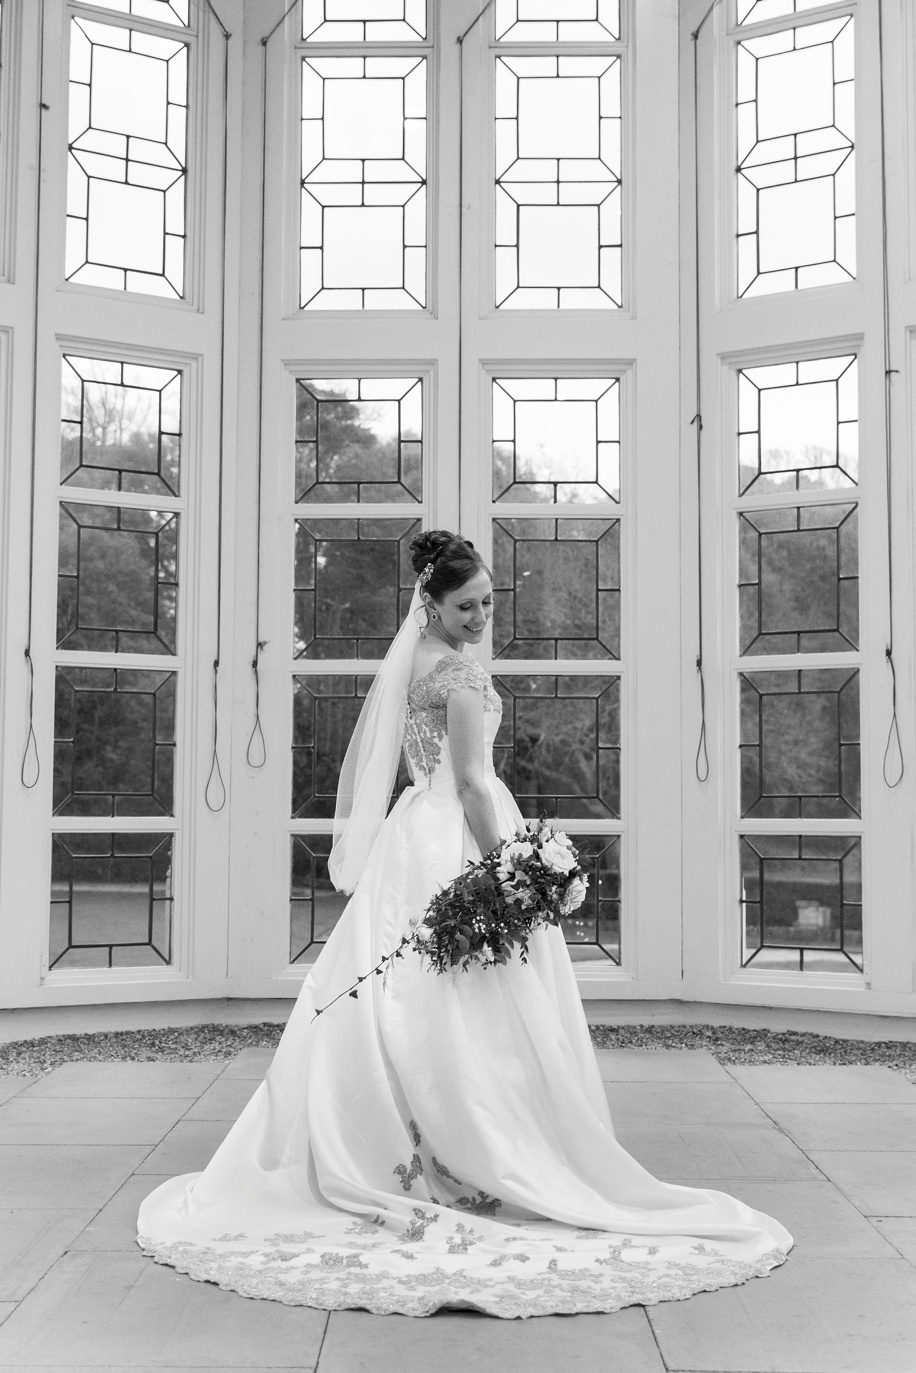 Highcliffe Castle weddings - Stunning Bridal portrait in the Winter Garden Suite